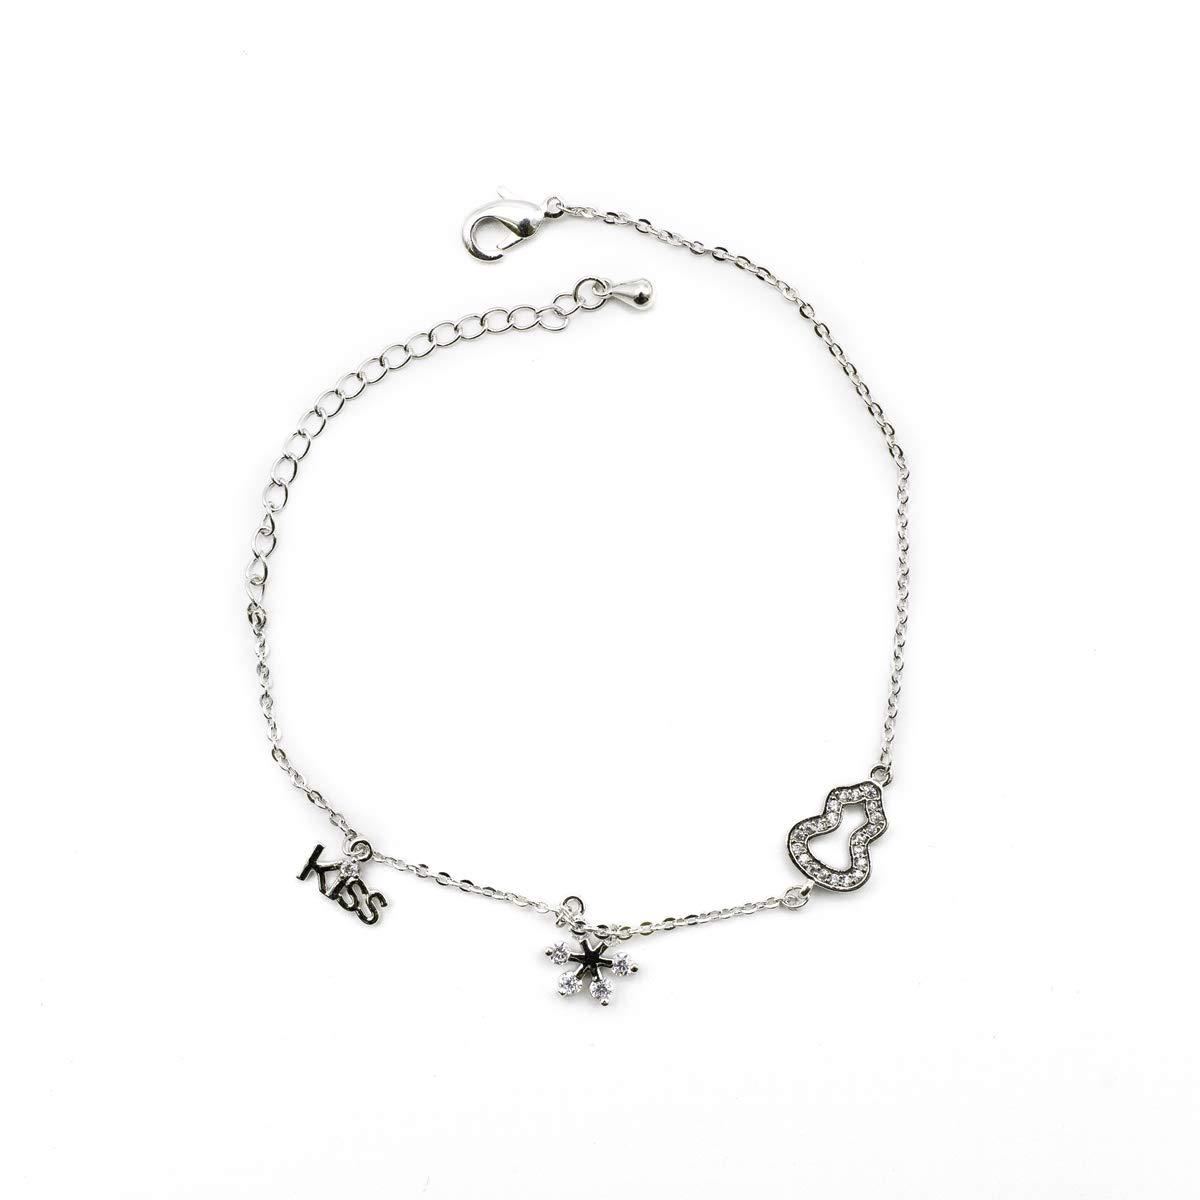 Kiyara accessories fashion jewellery tiffany inspired palomas graffiti kiss adjustable bracelet for women and girls amazon in jewellery